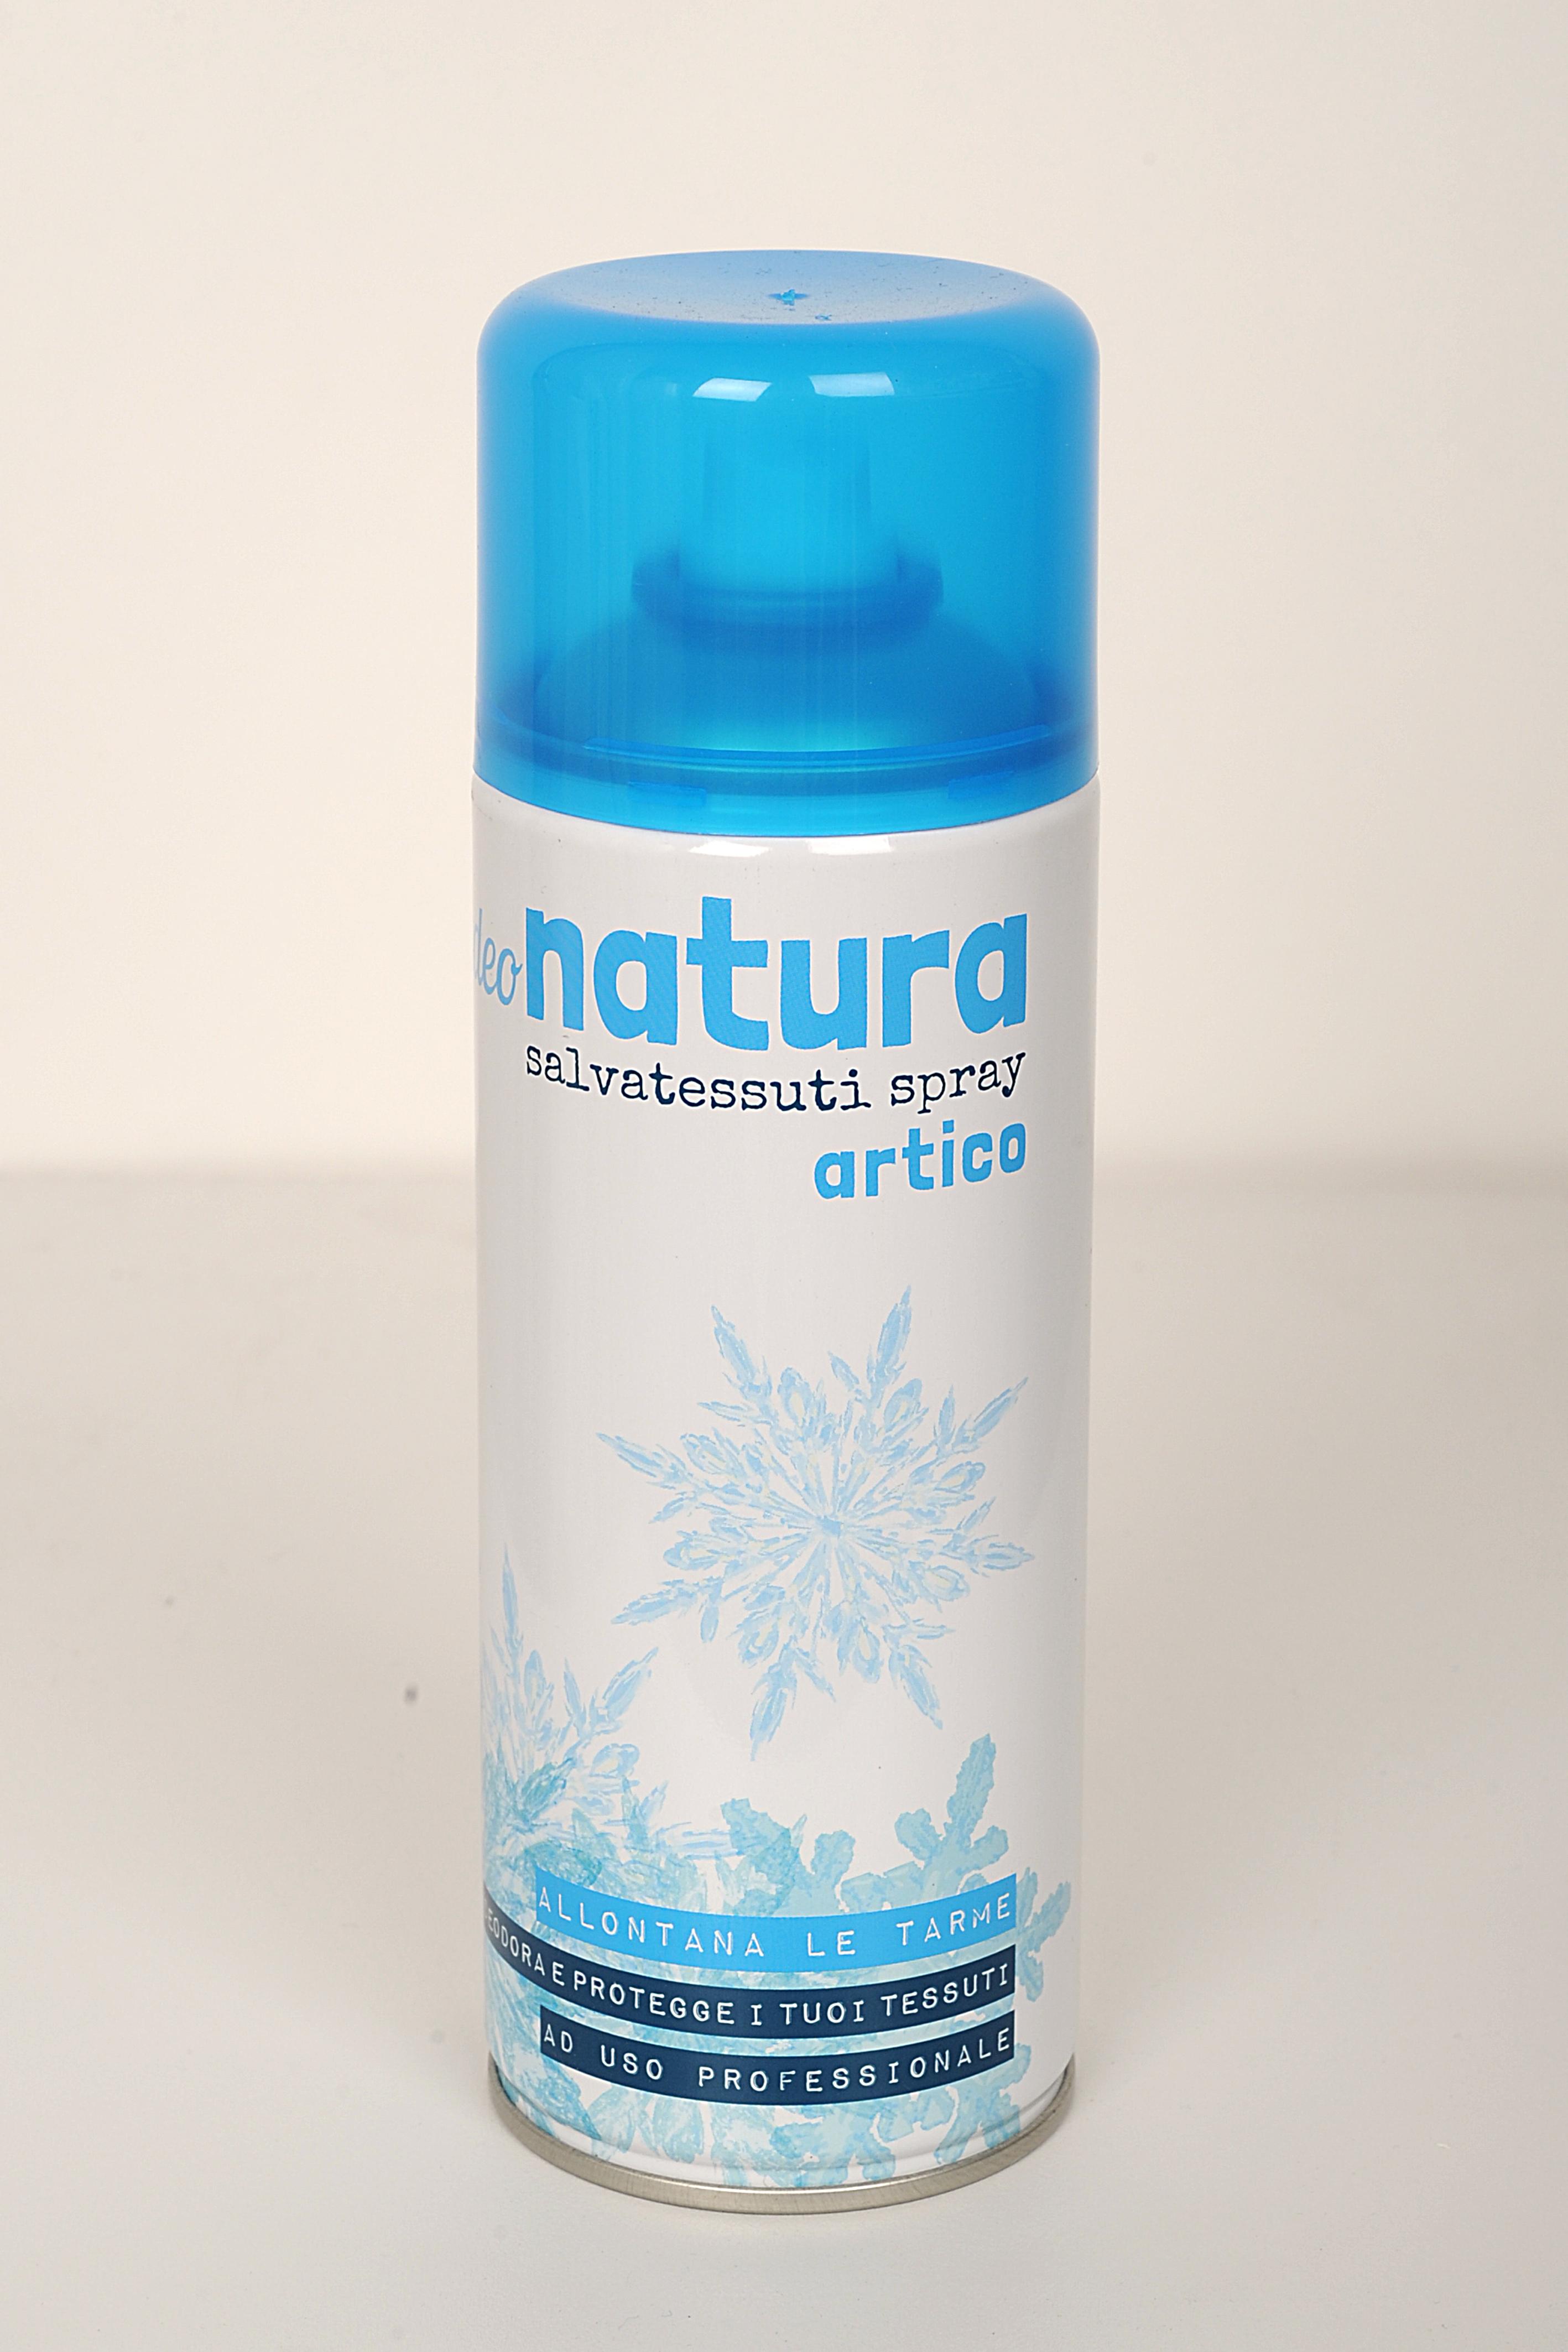 Spray artico deodorante antitarme